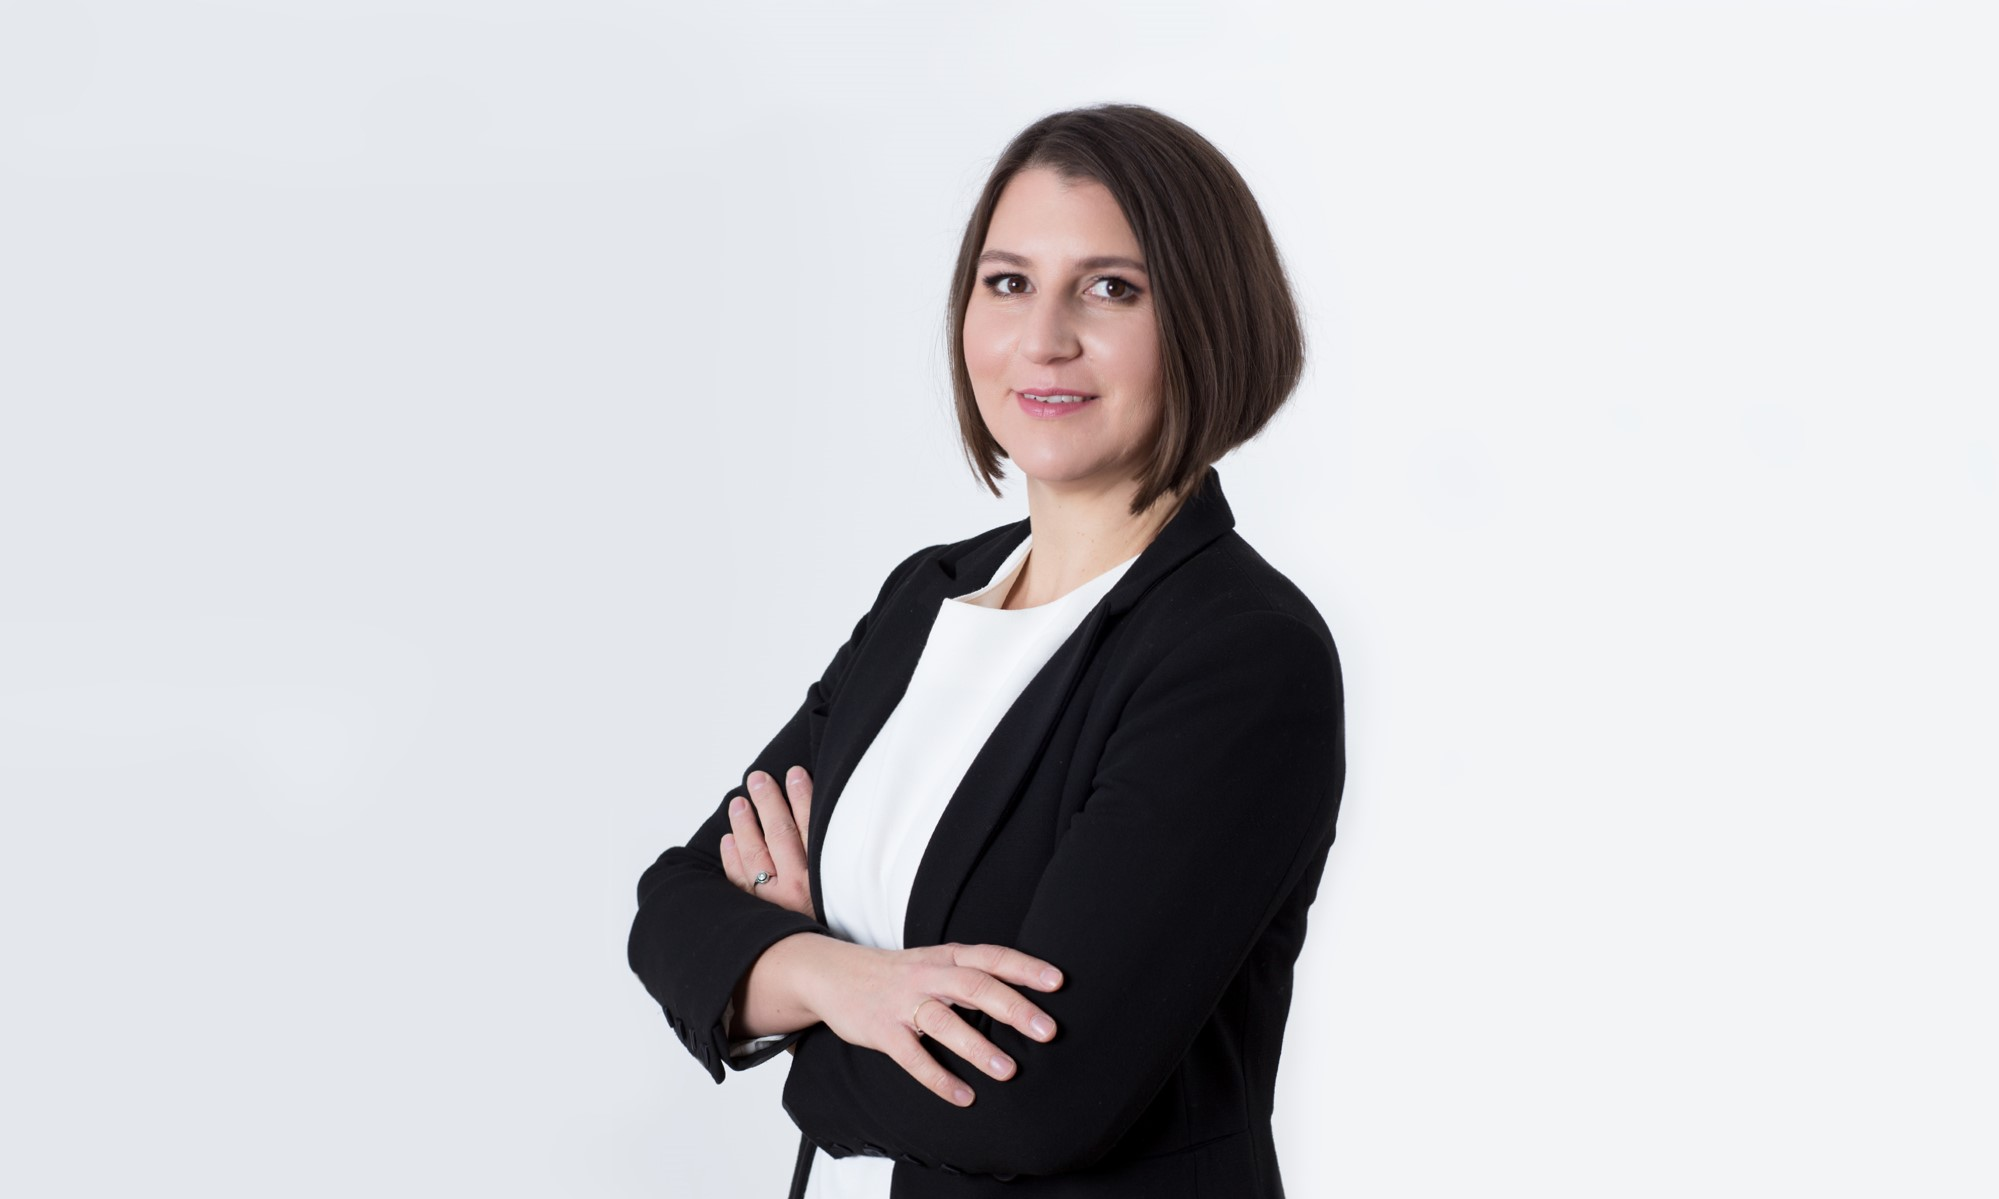 Agata Kurowska radca prawny